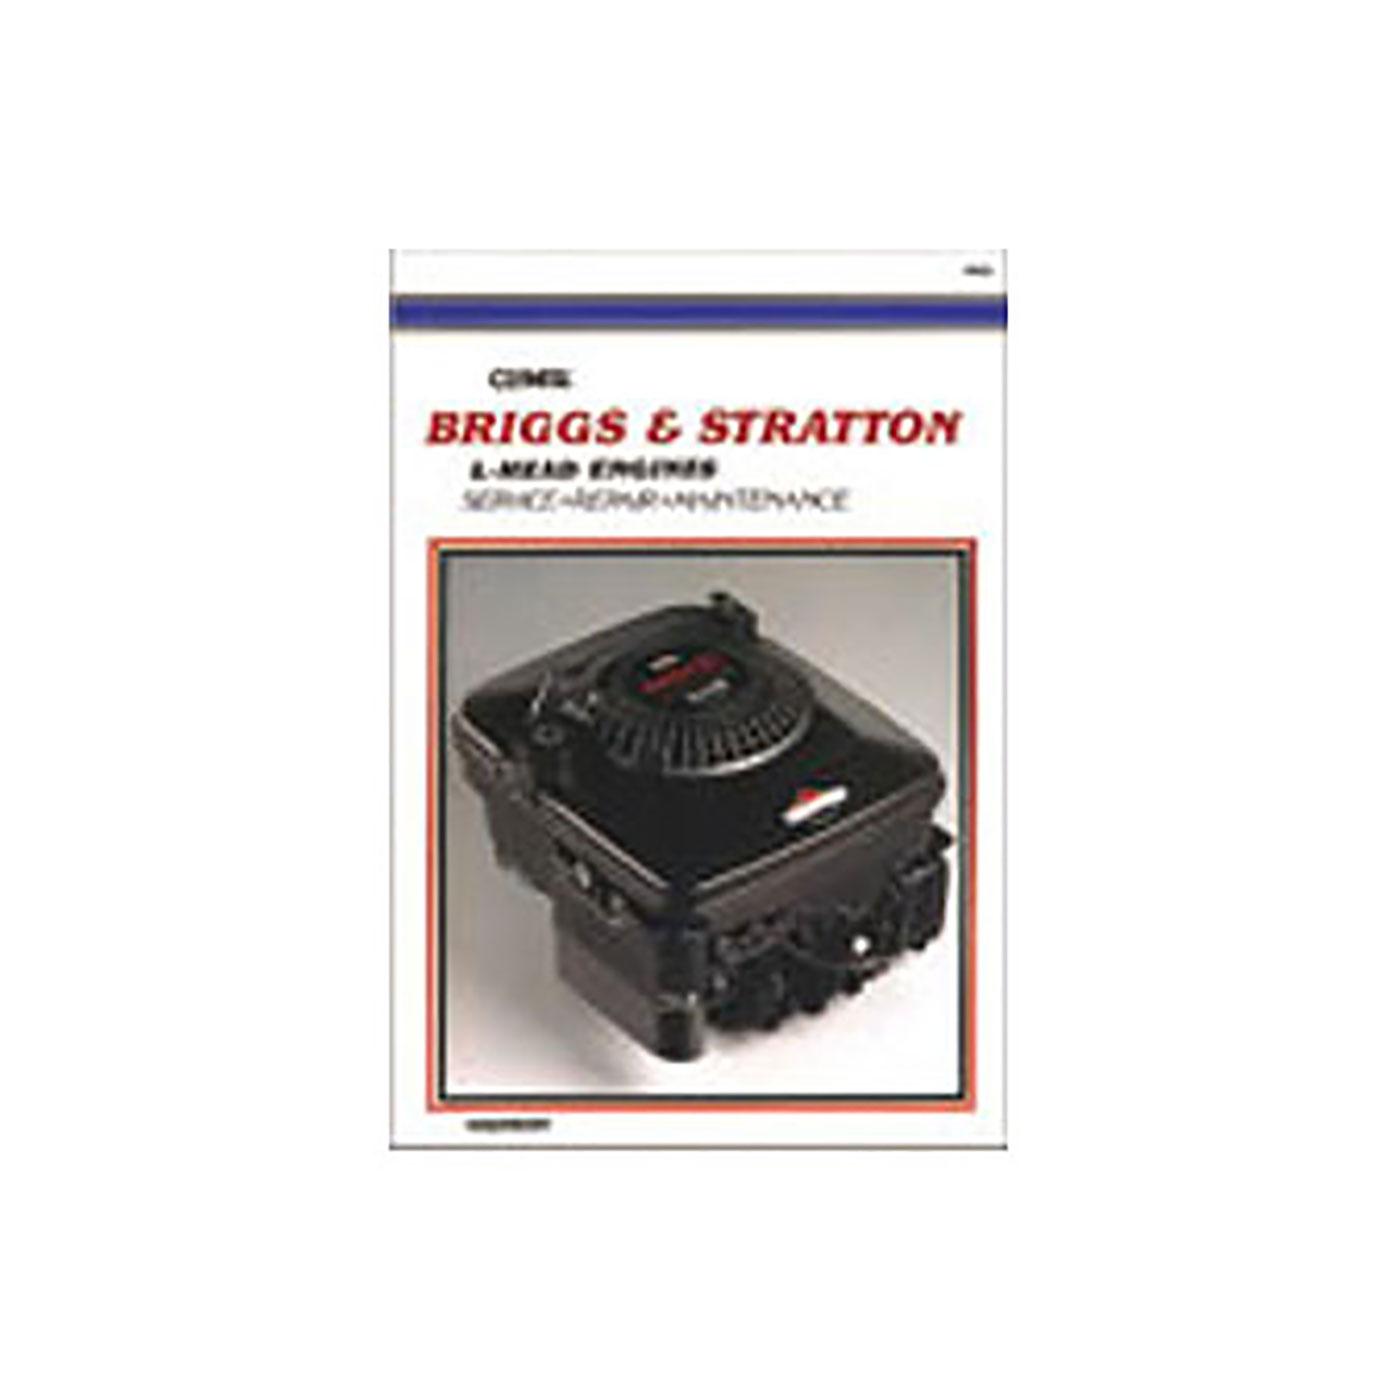 Briggs & Stratton L-Head Engines